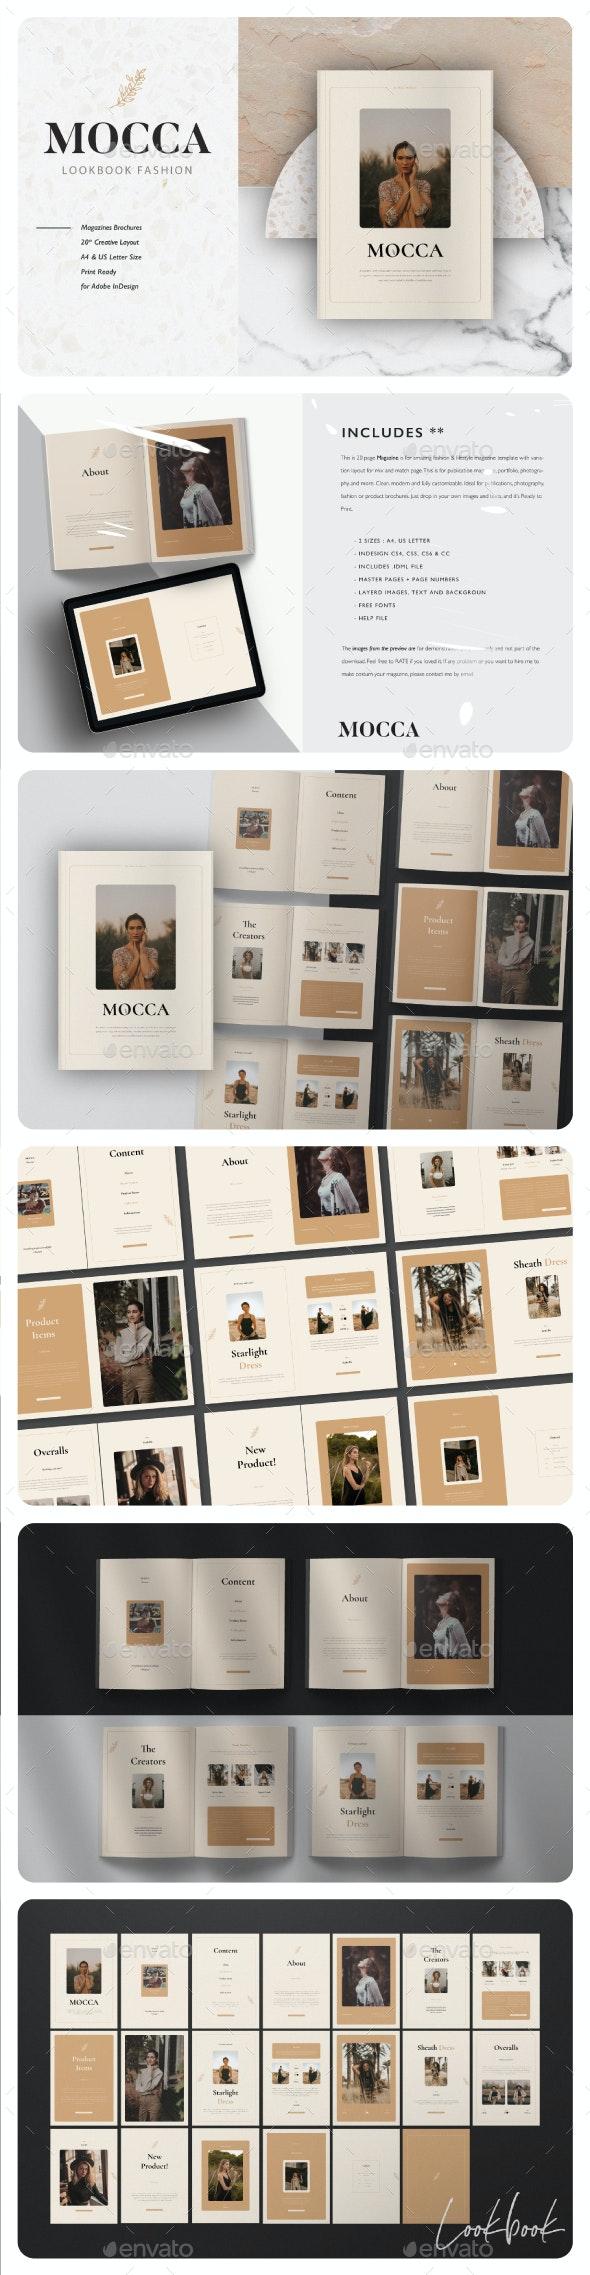 Mocca Lookbook Fashion - Magazines Print Templates